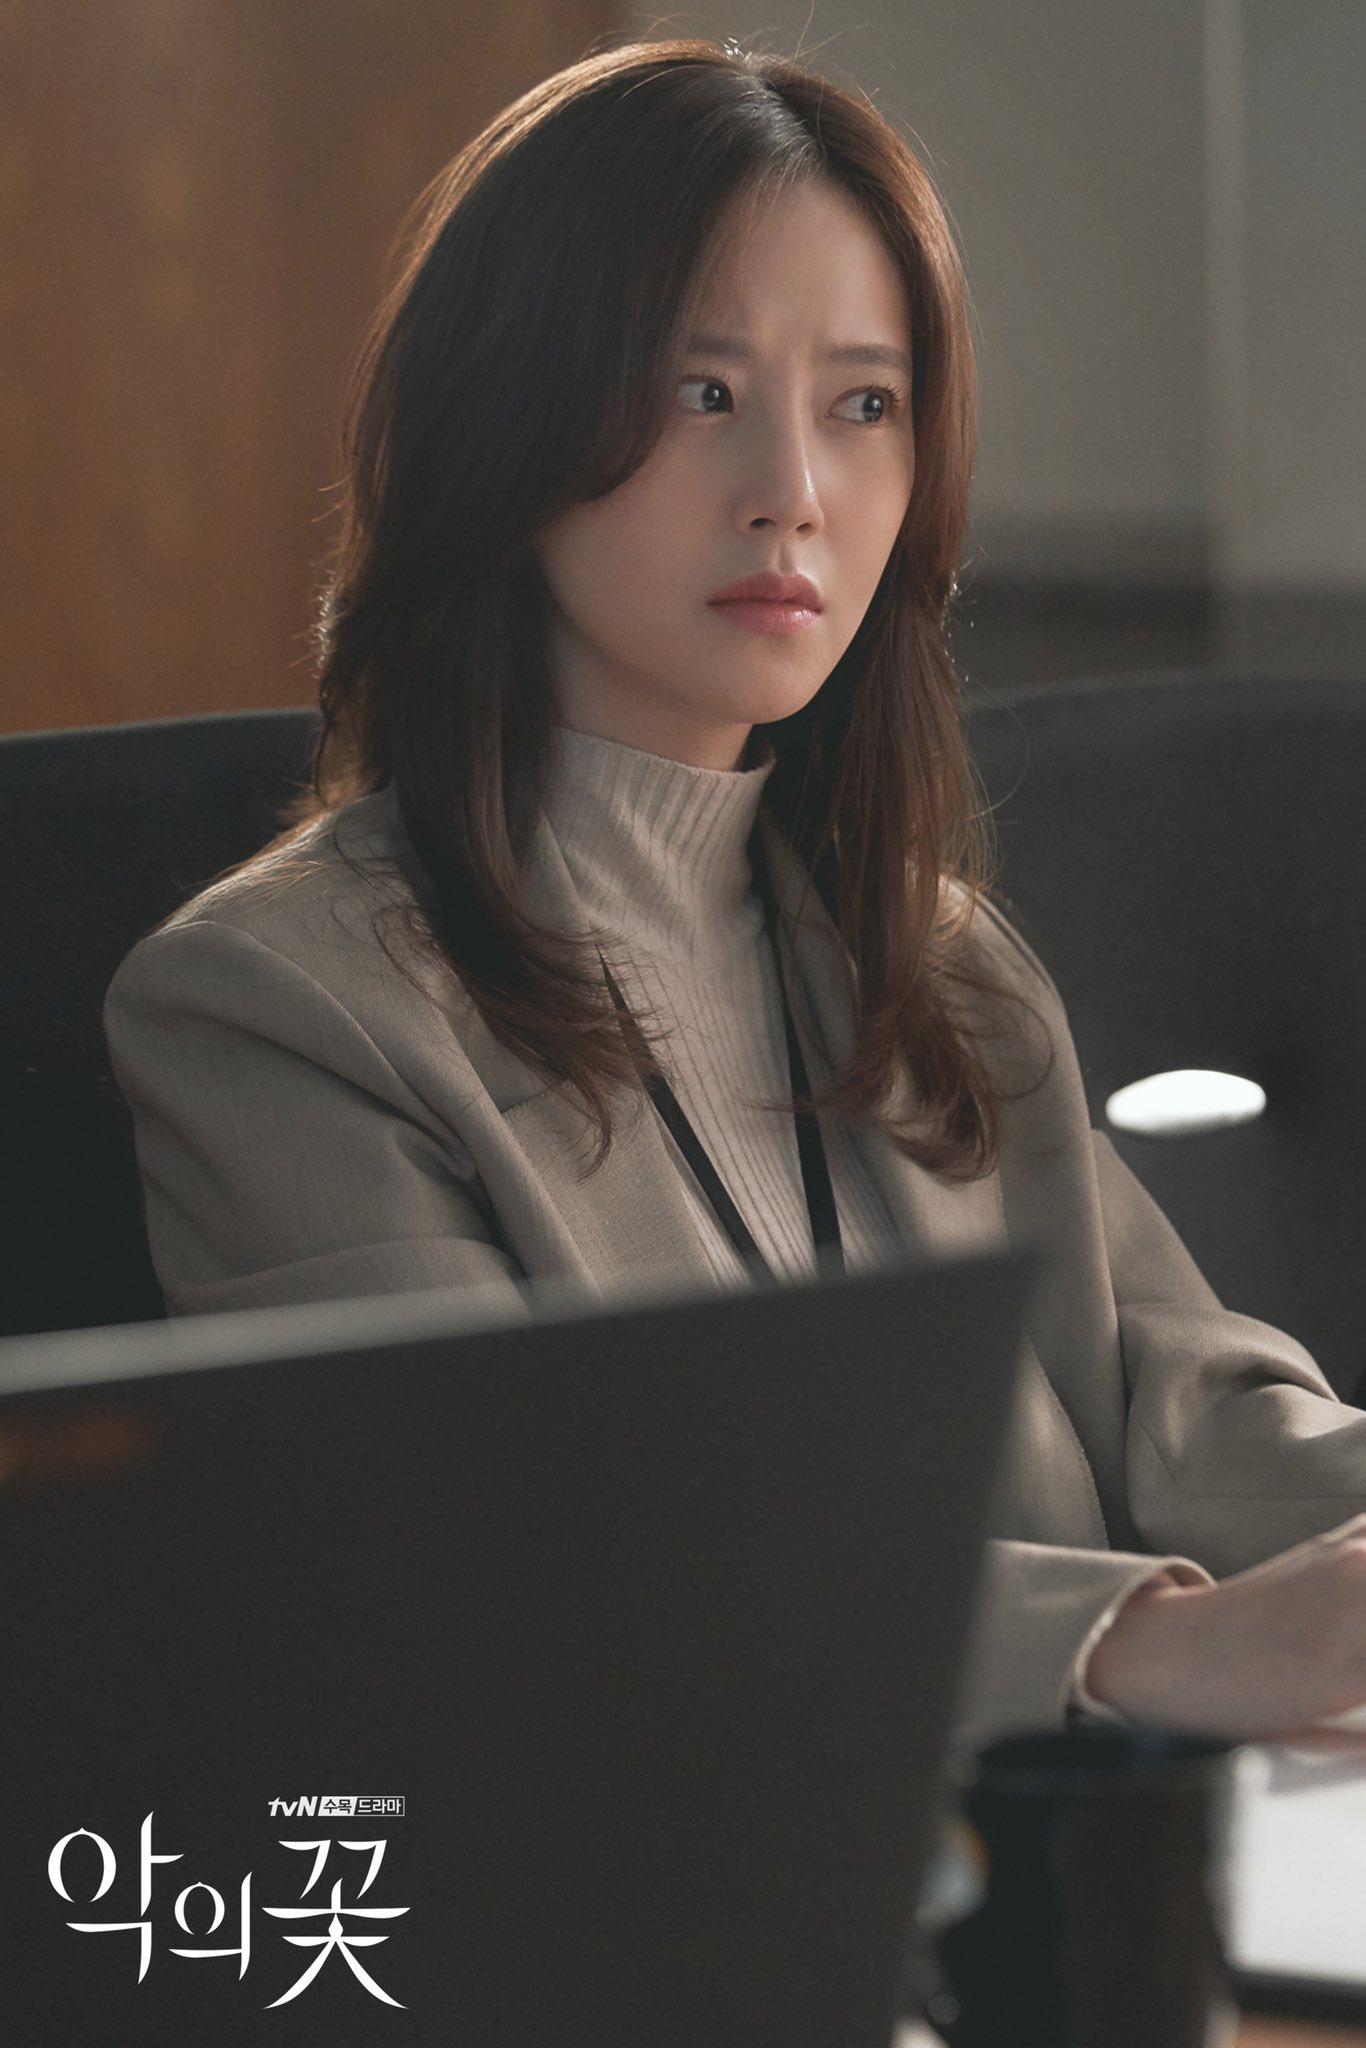 Moon Chae Won